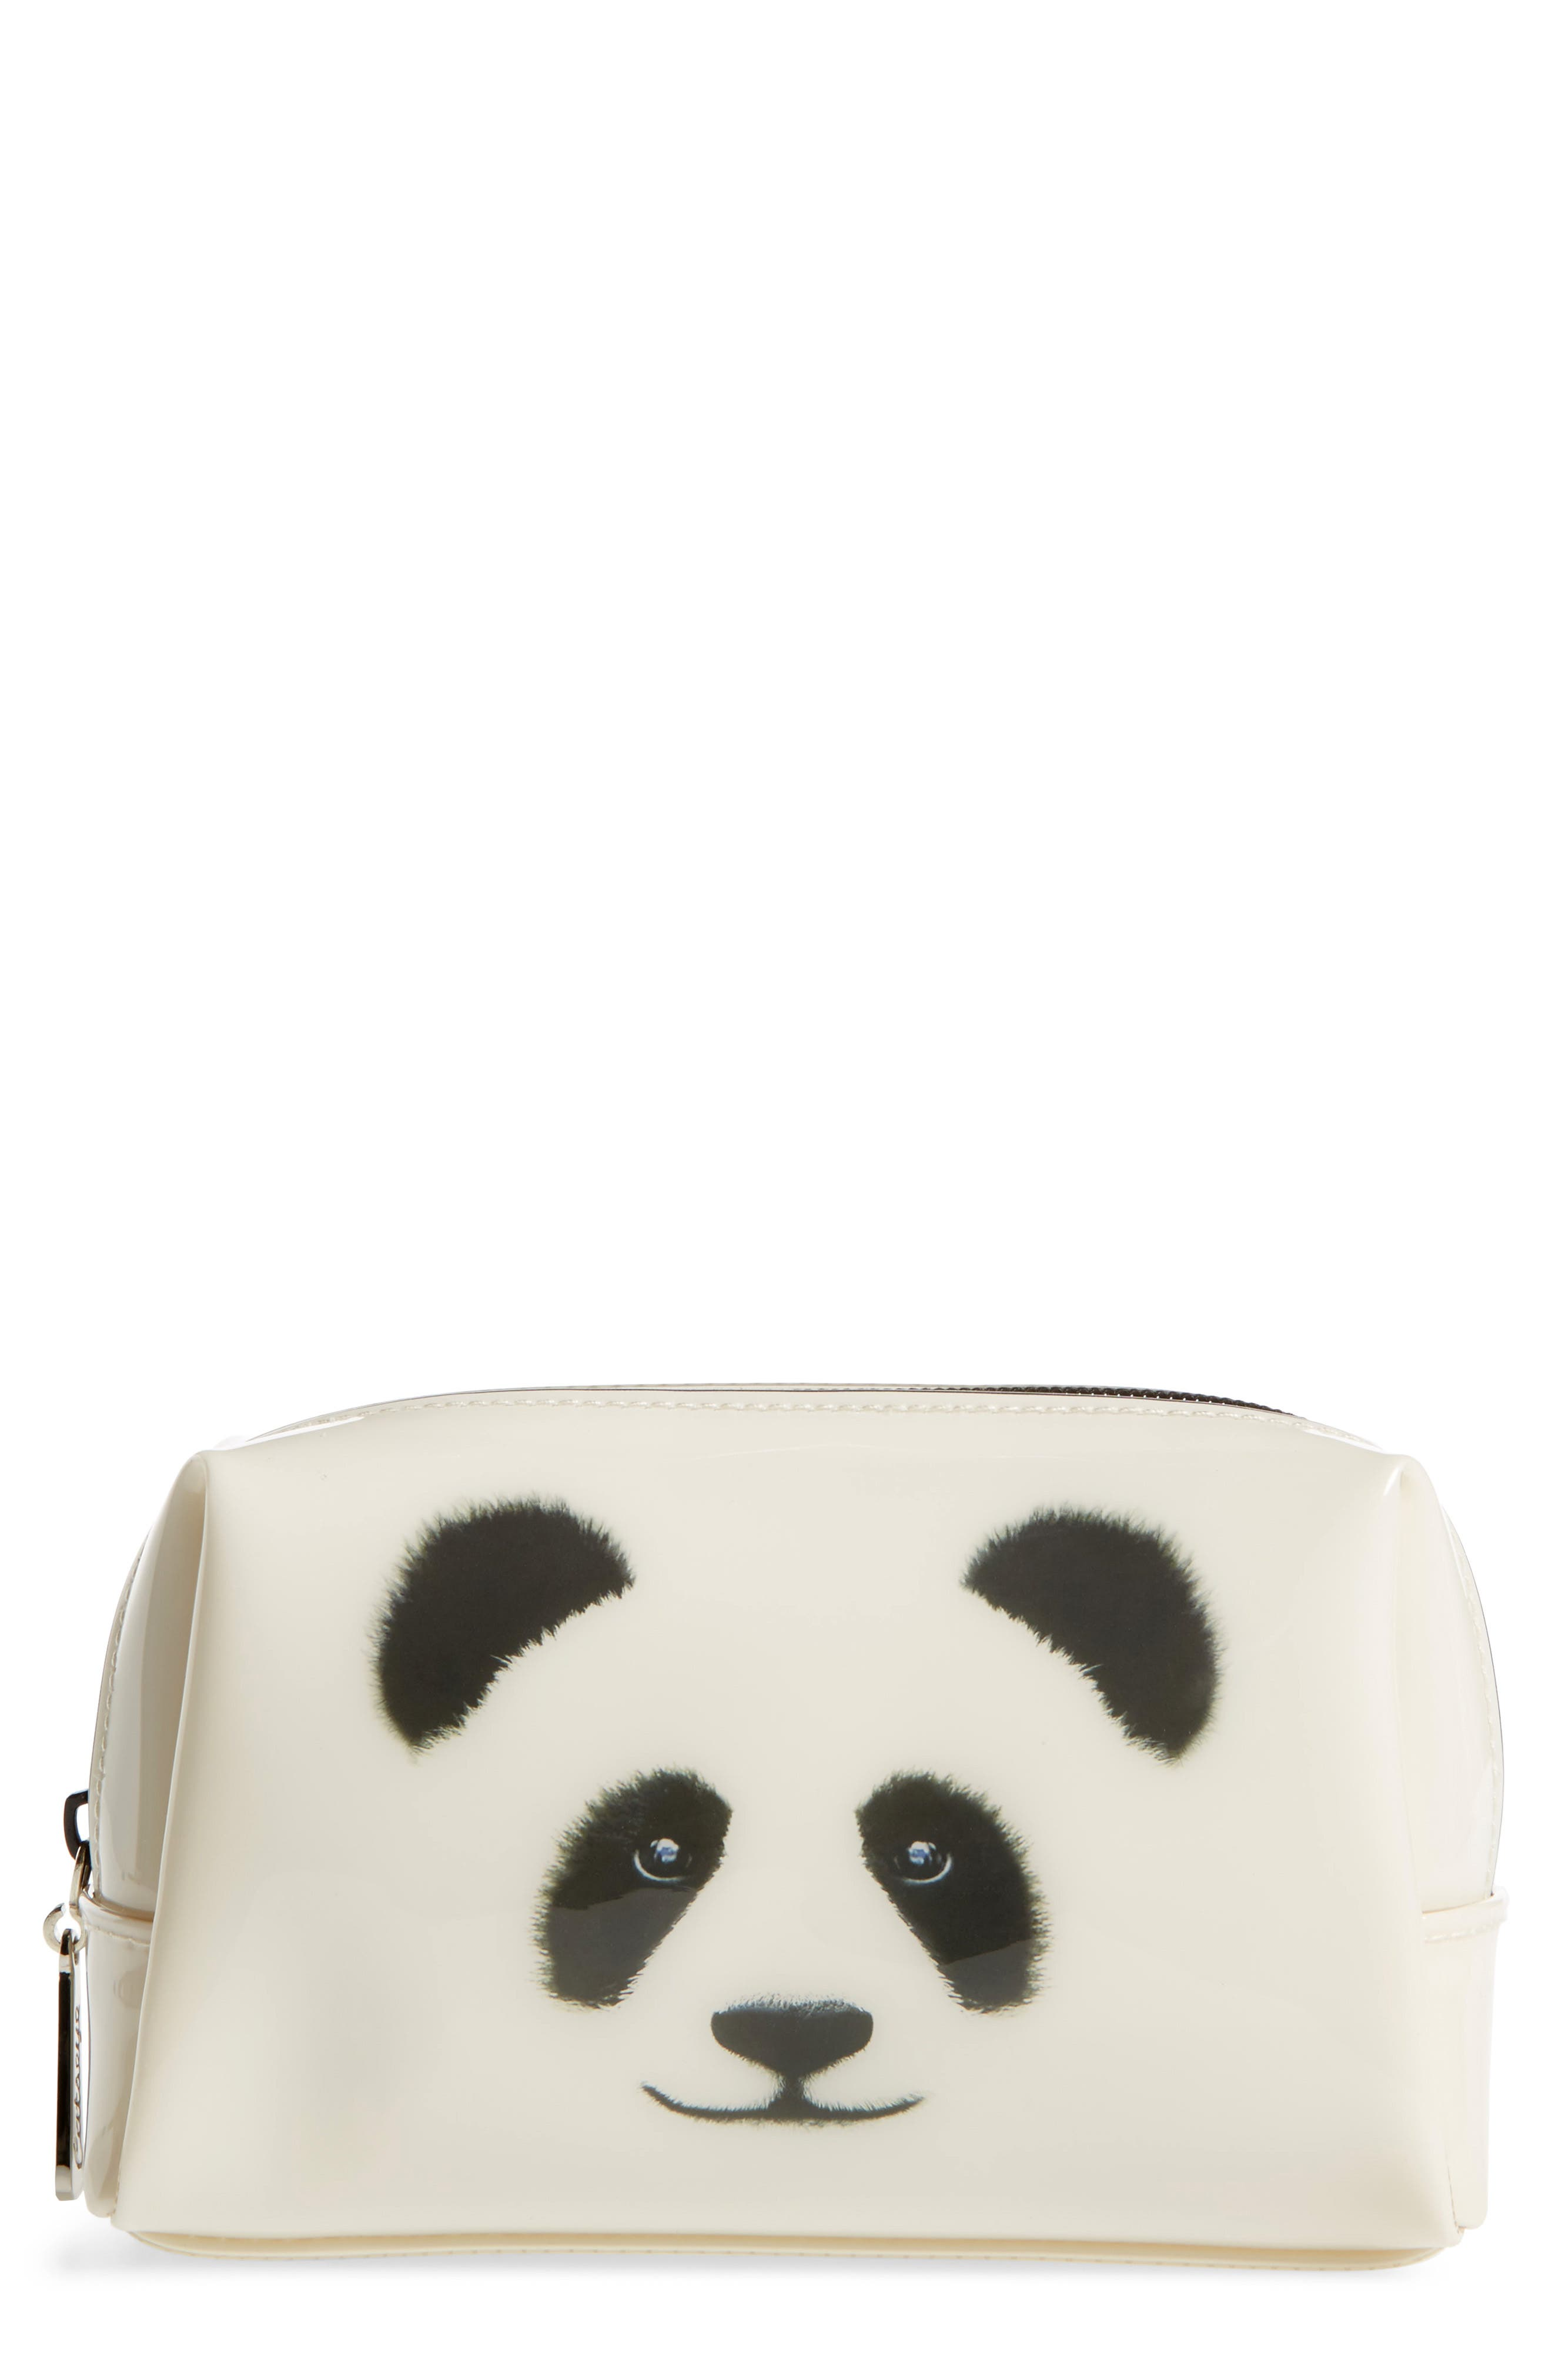 Monochrome Panda Cosmetics Bag,                             Main thumbnail 1, color,                             101